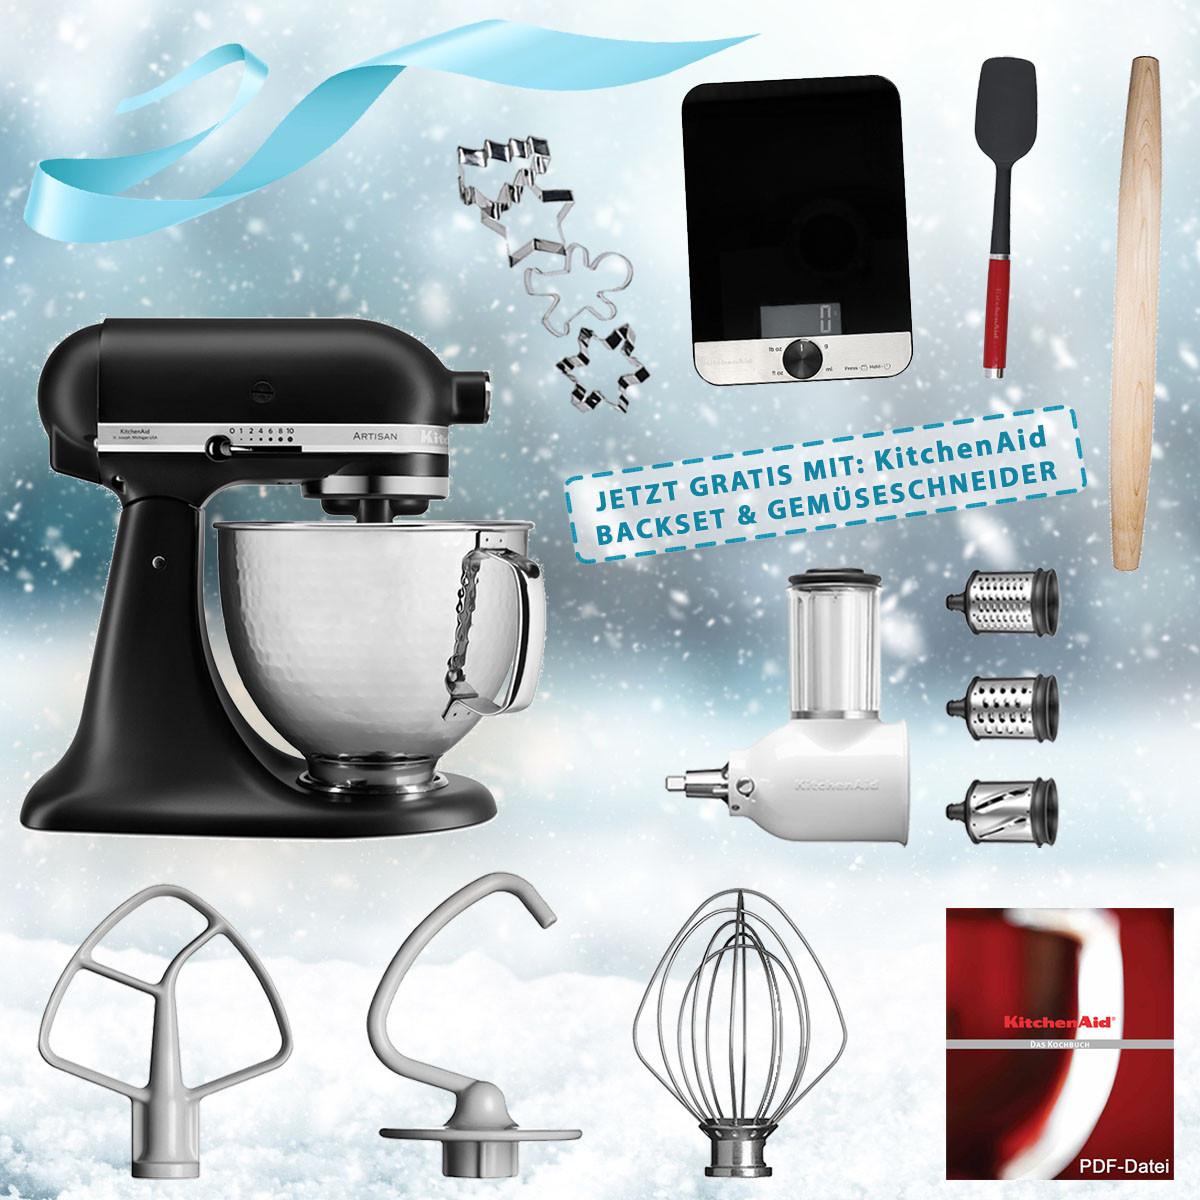 KitchenAid Artisan Küchenmaschine matt schwarz 5KSM156HMEBM + 5KSMVSA